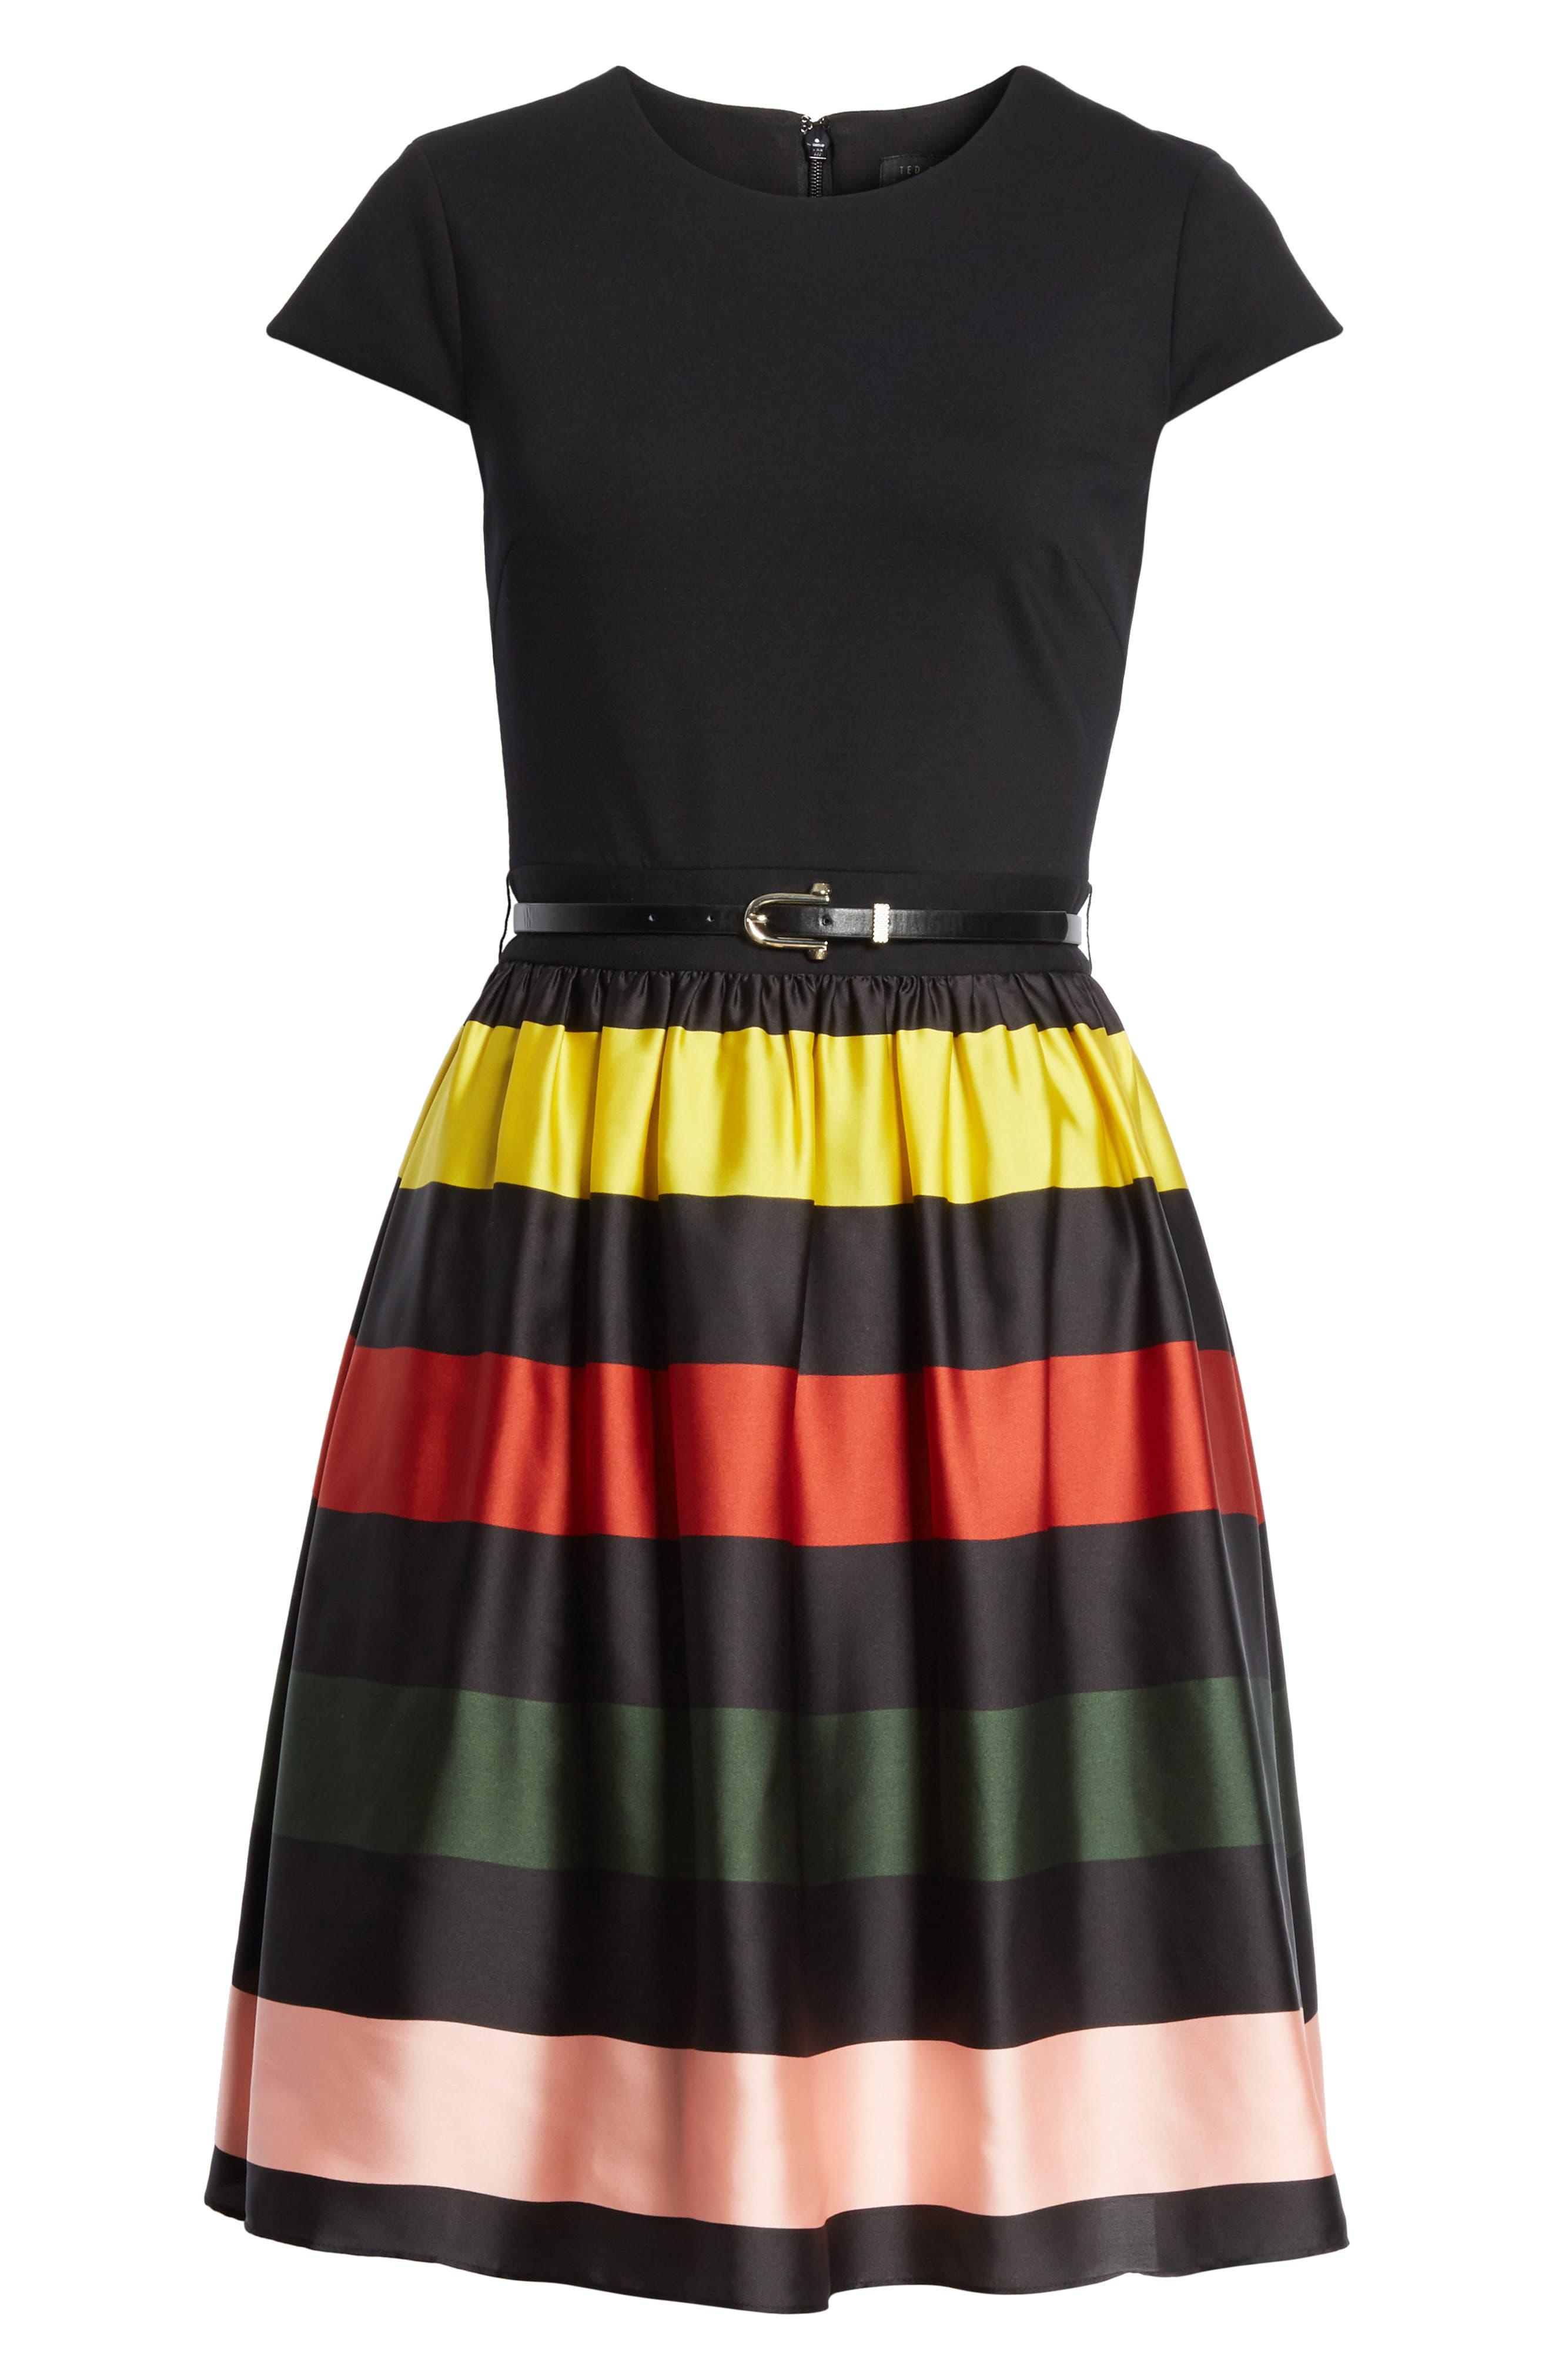 TED BAKER LONDON,                             Cruise Stripe Fit & Flare Dress,                             Alternate thumbnail 6, color,                             001